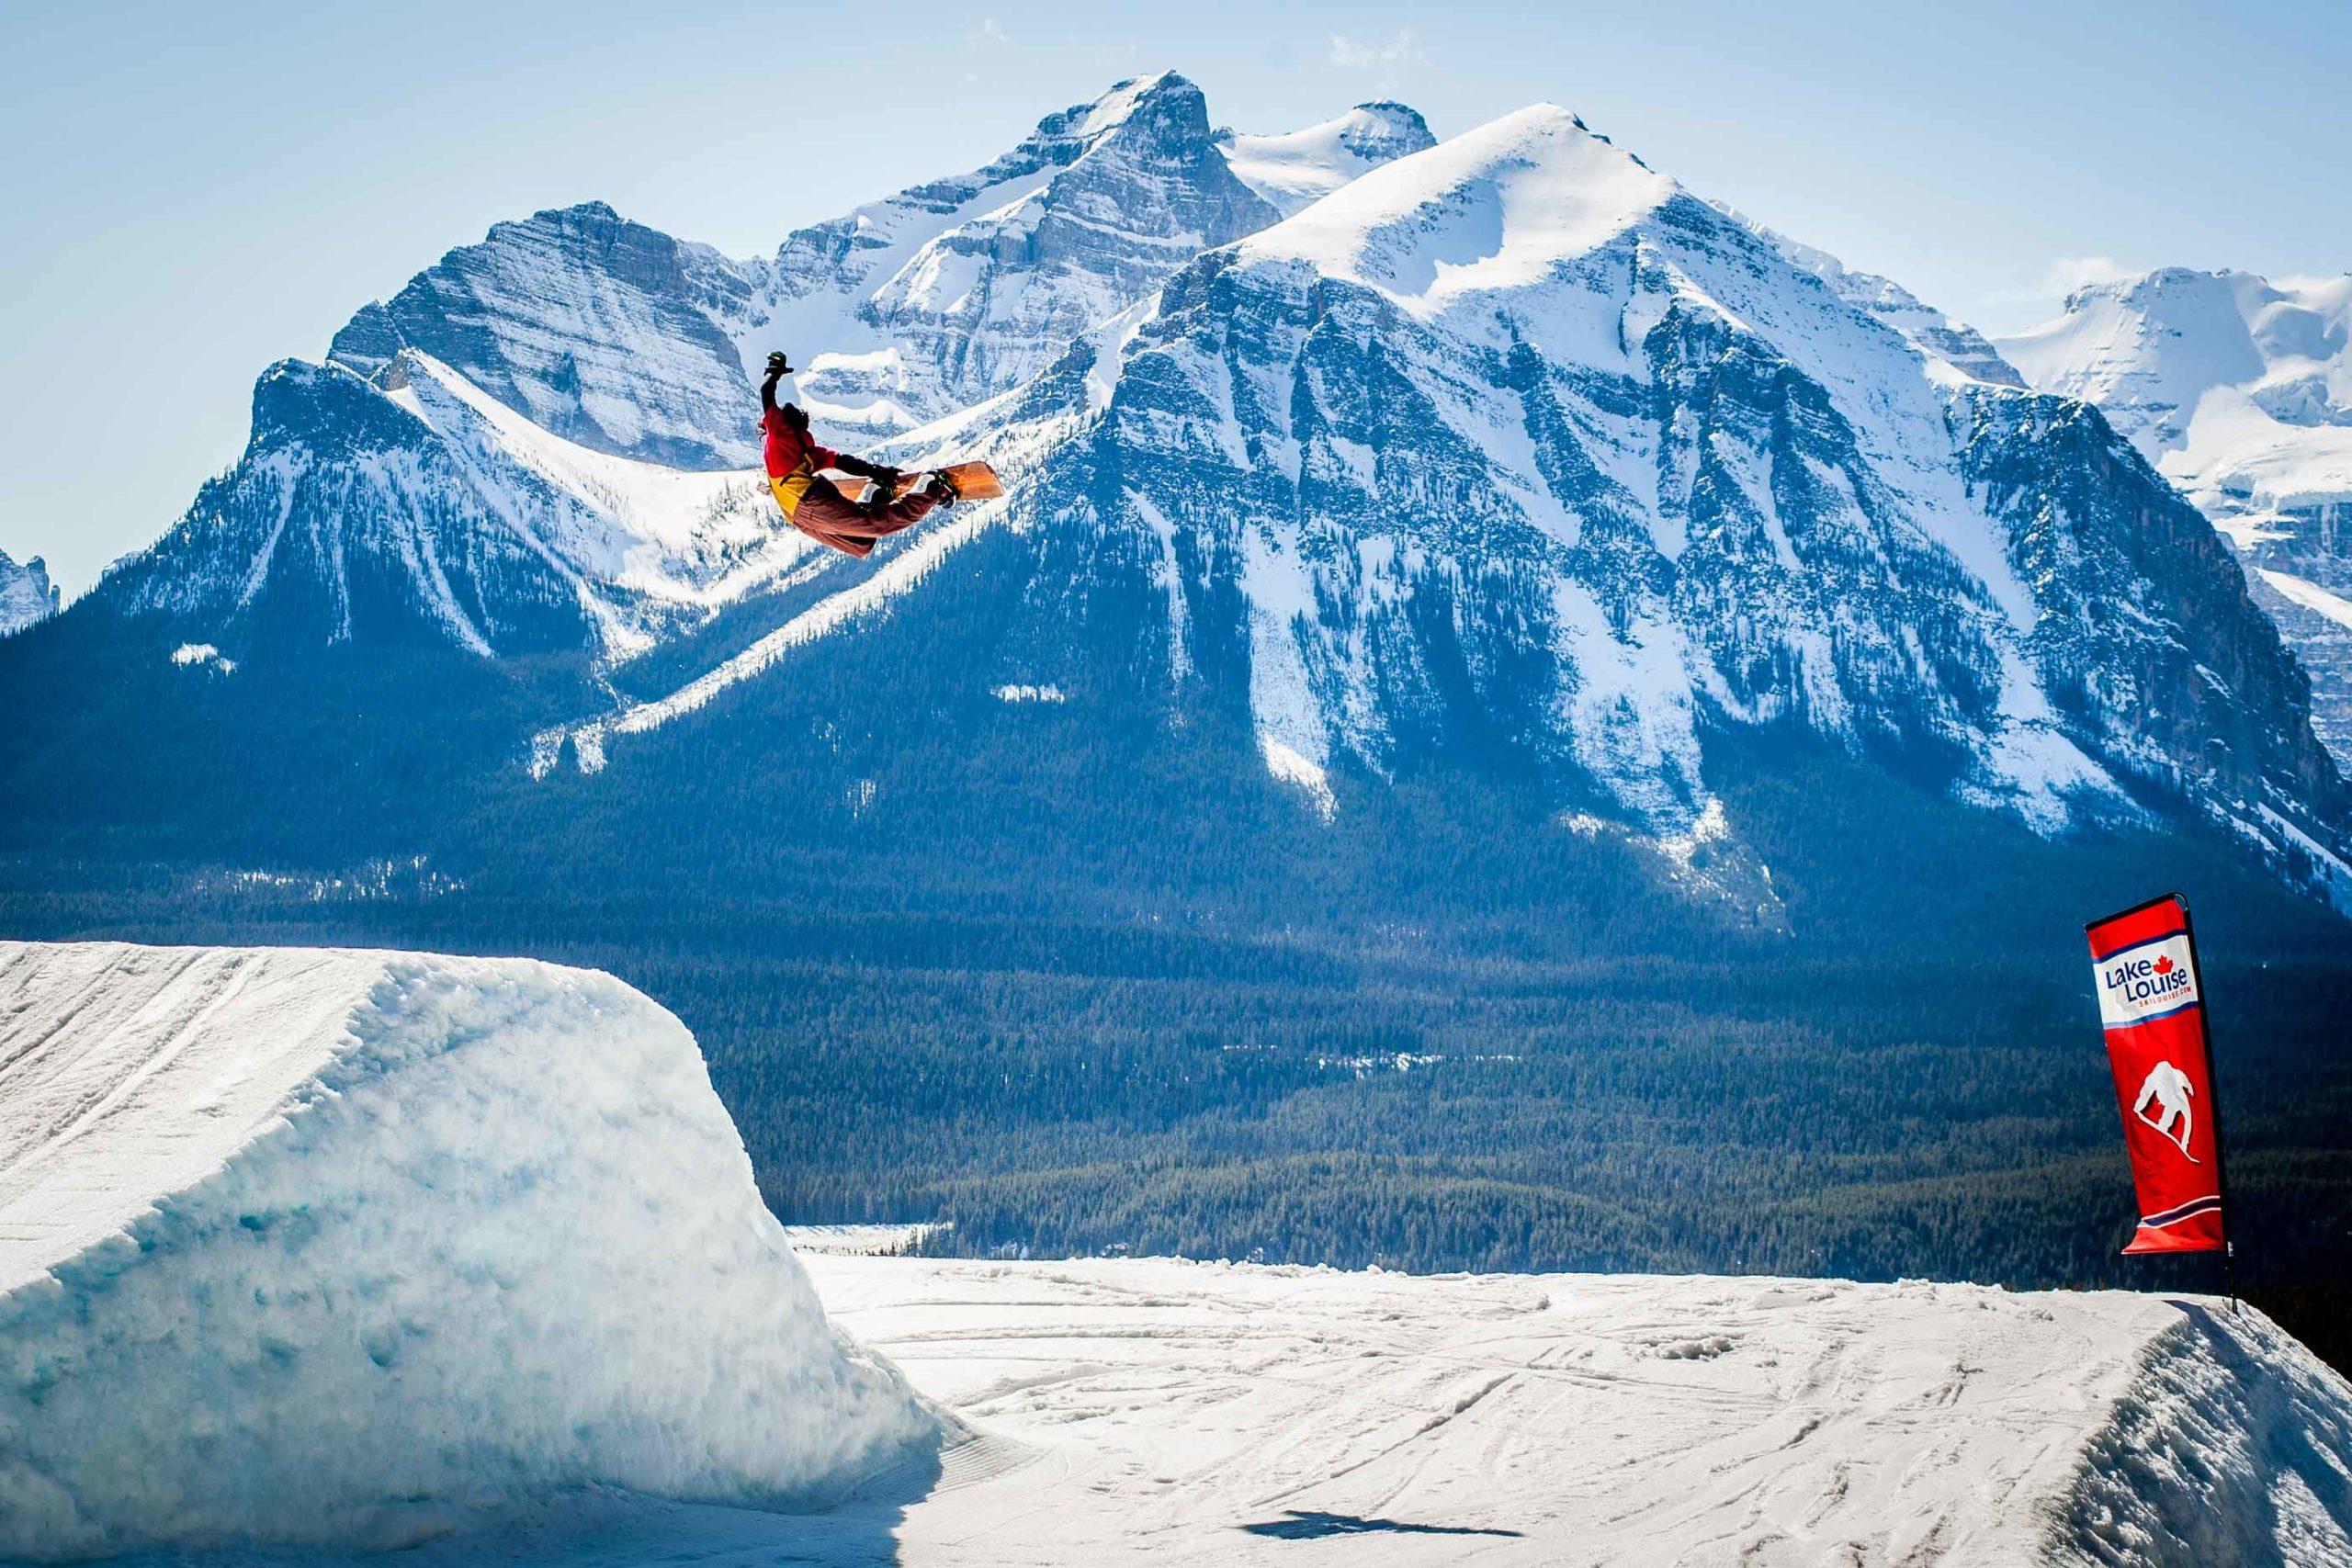 Canadian Rockies Ski Guide Lake Louise